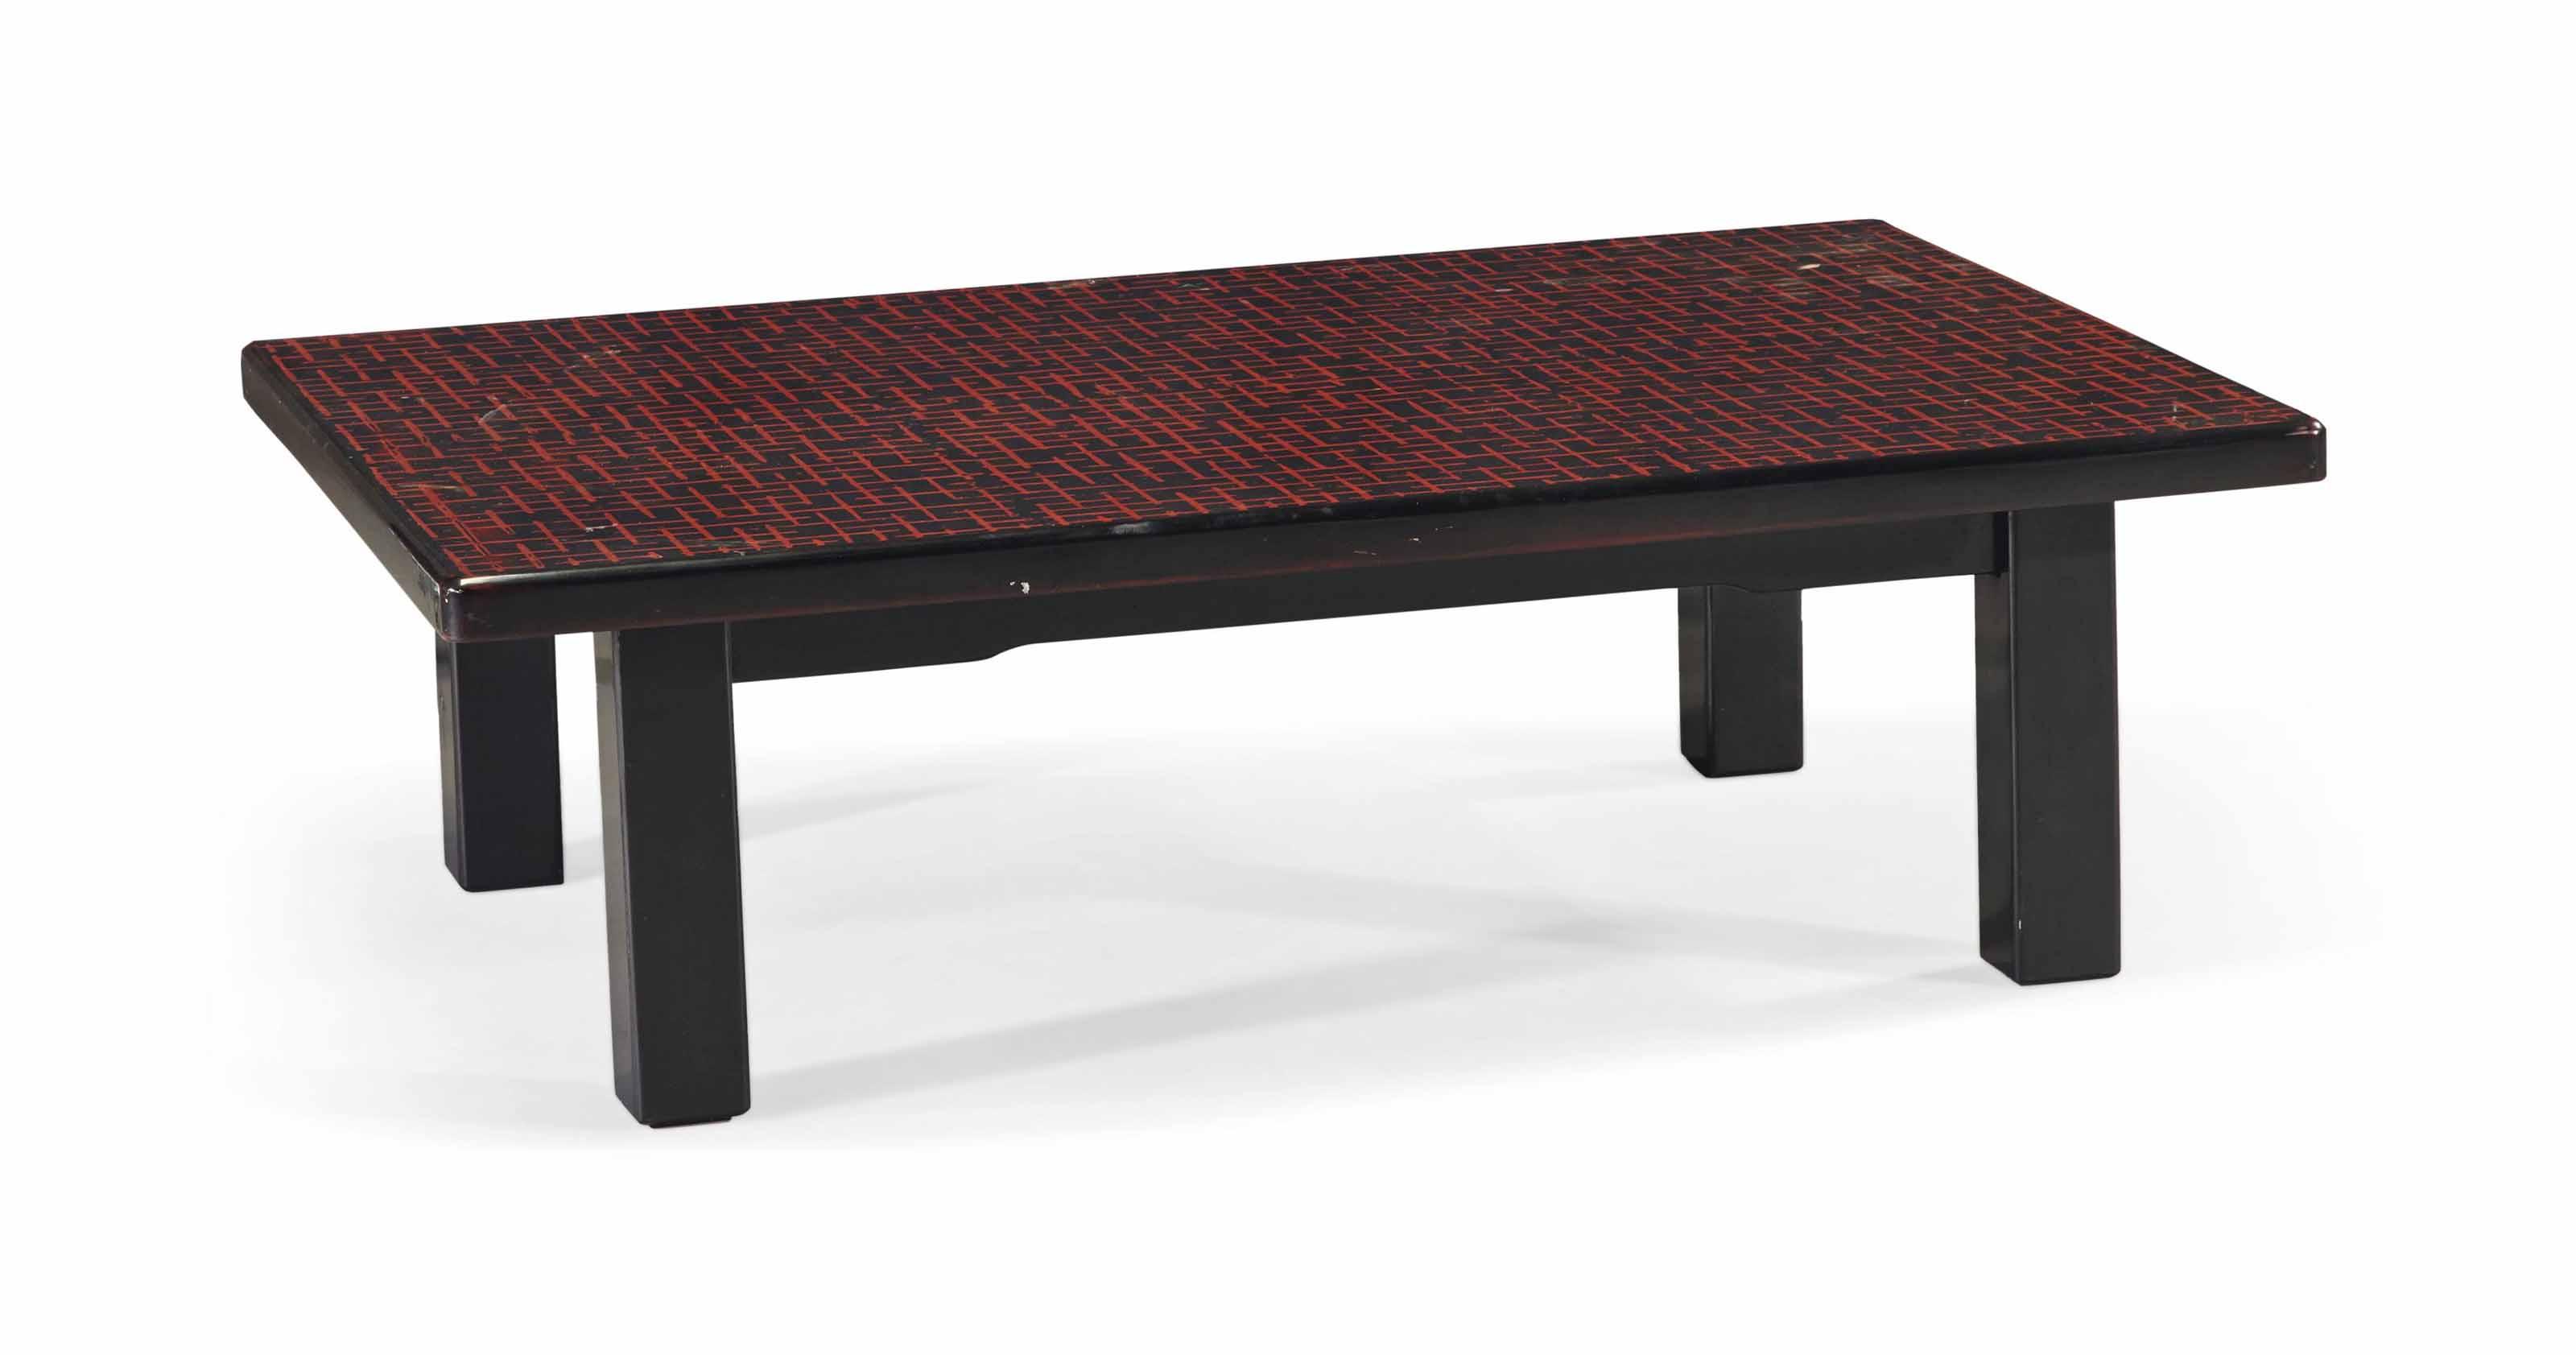 table basse japonaise table basse kontiki pierre de lave. Black Bedroom Furniture Sets. Home Design Ideas